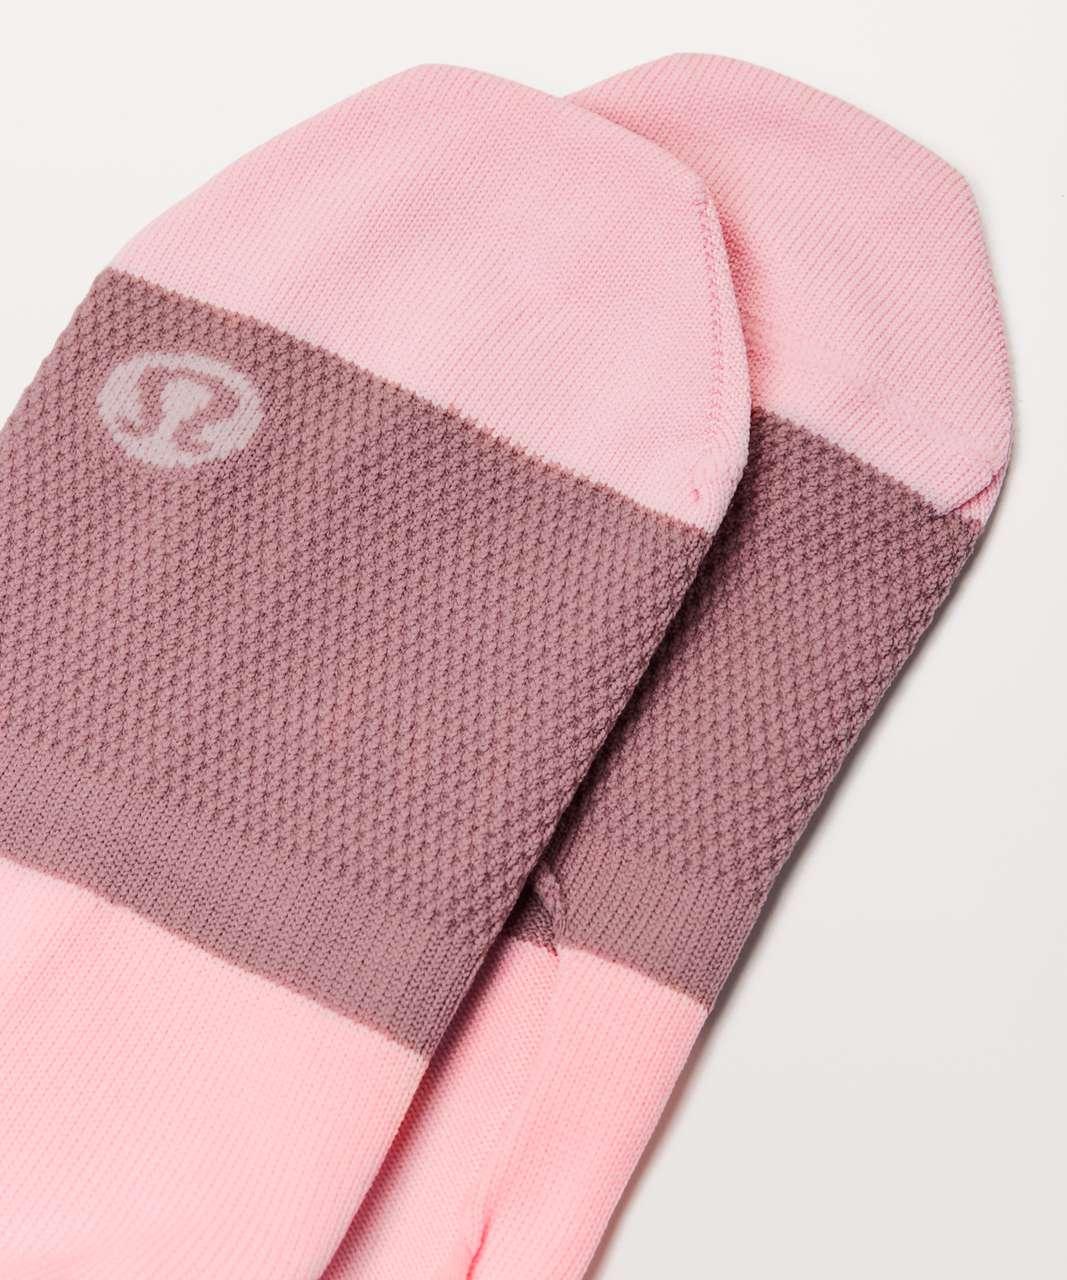 Lululemon Secret Sock - Quicksand / Dusty Pink / Cupcake Pink